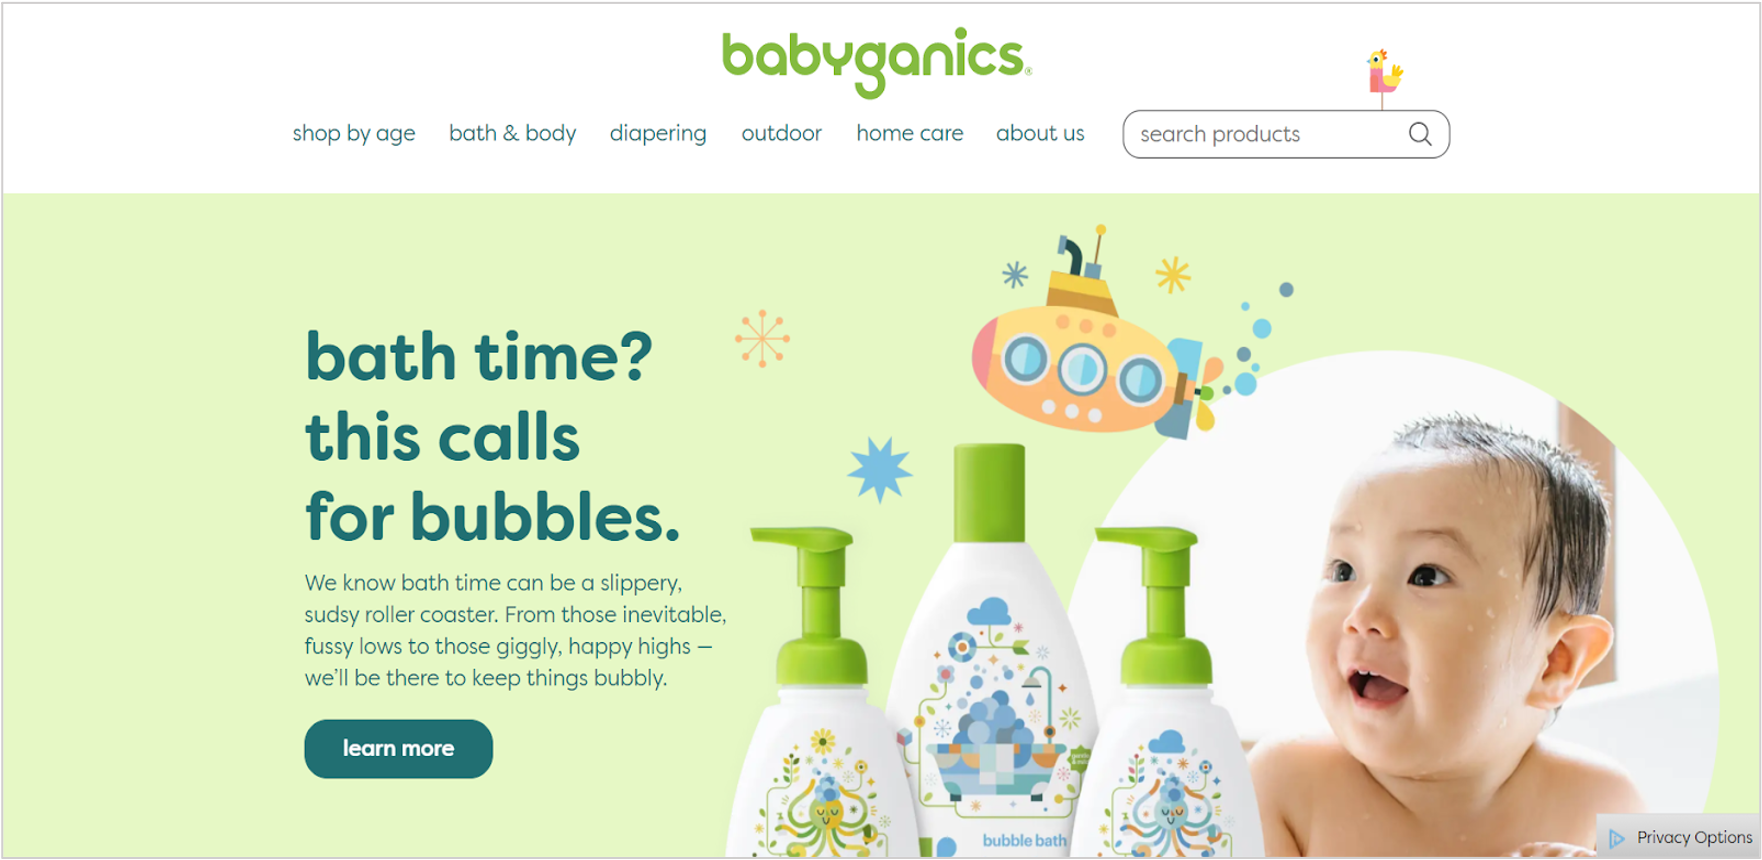 Babyganics homepage